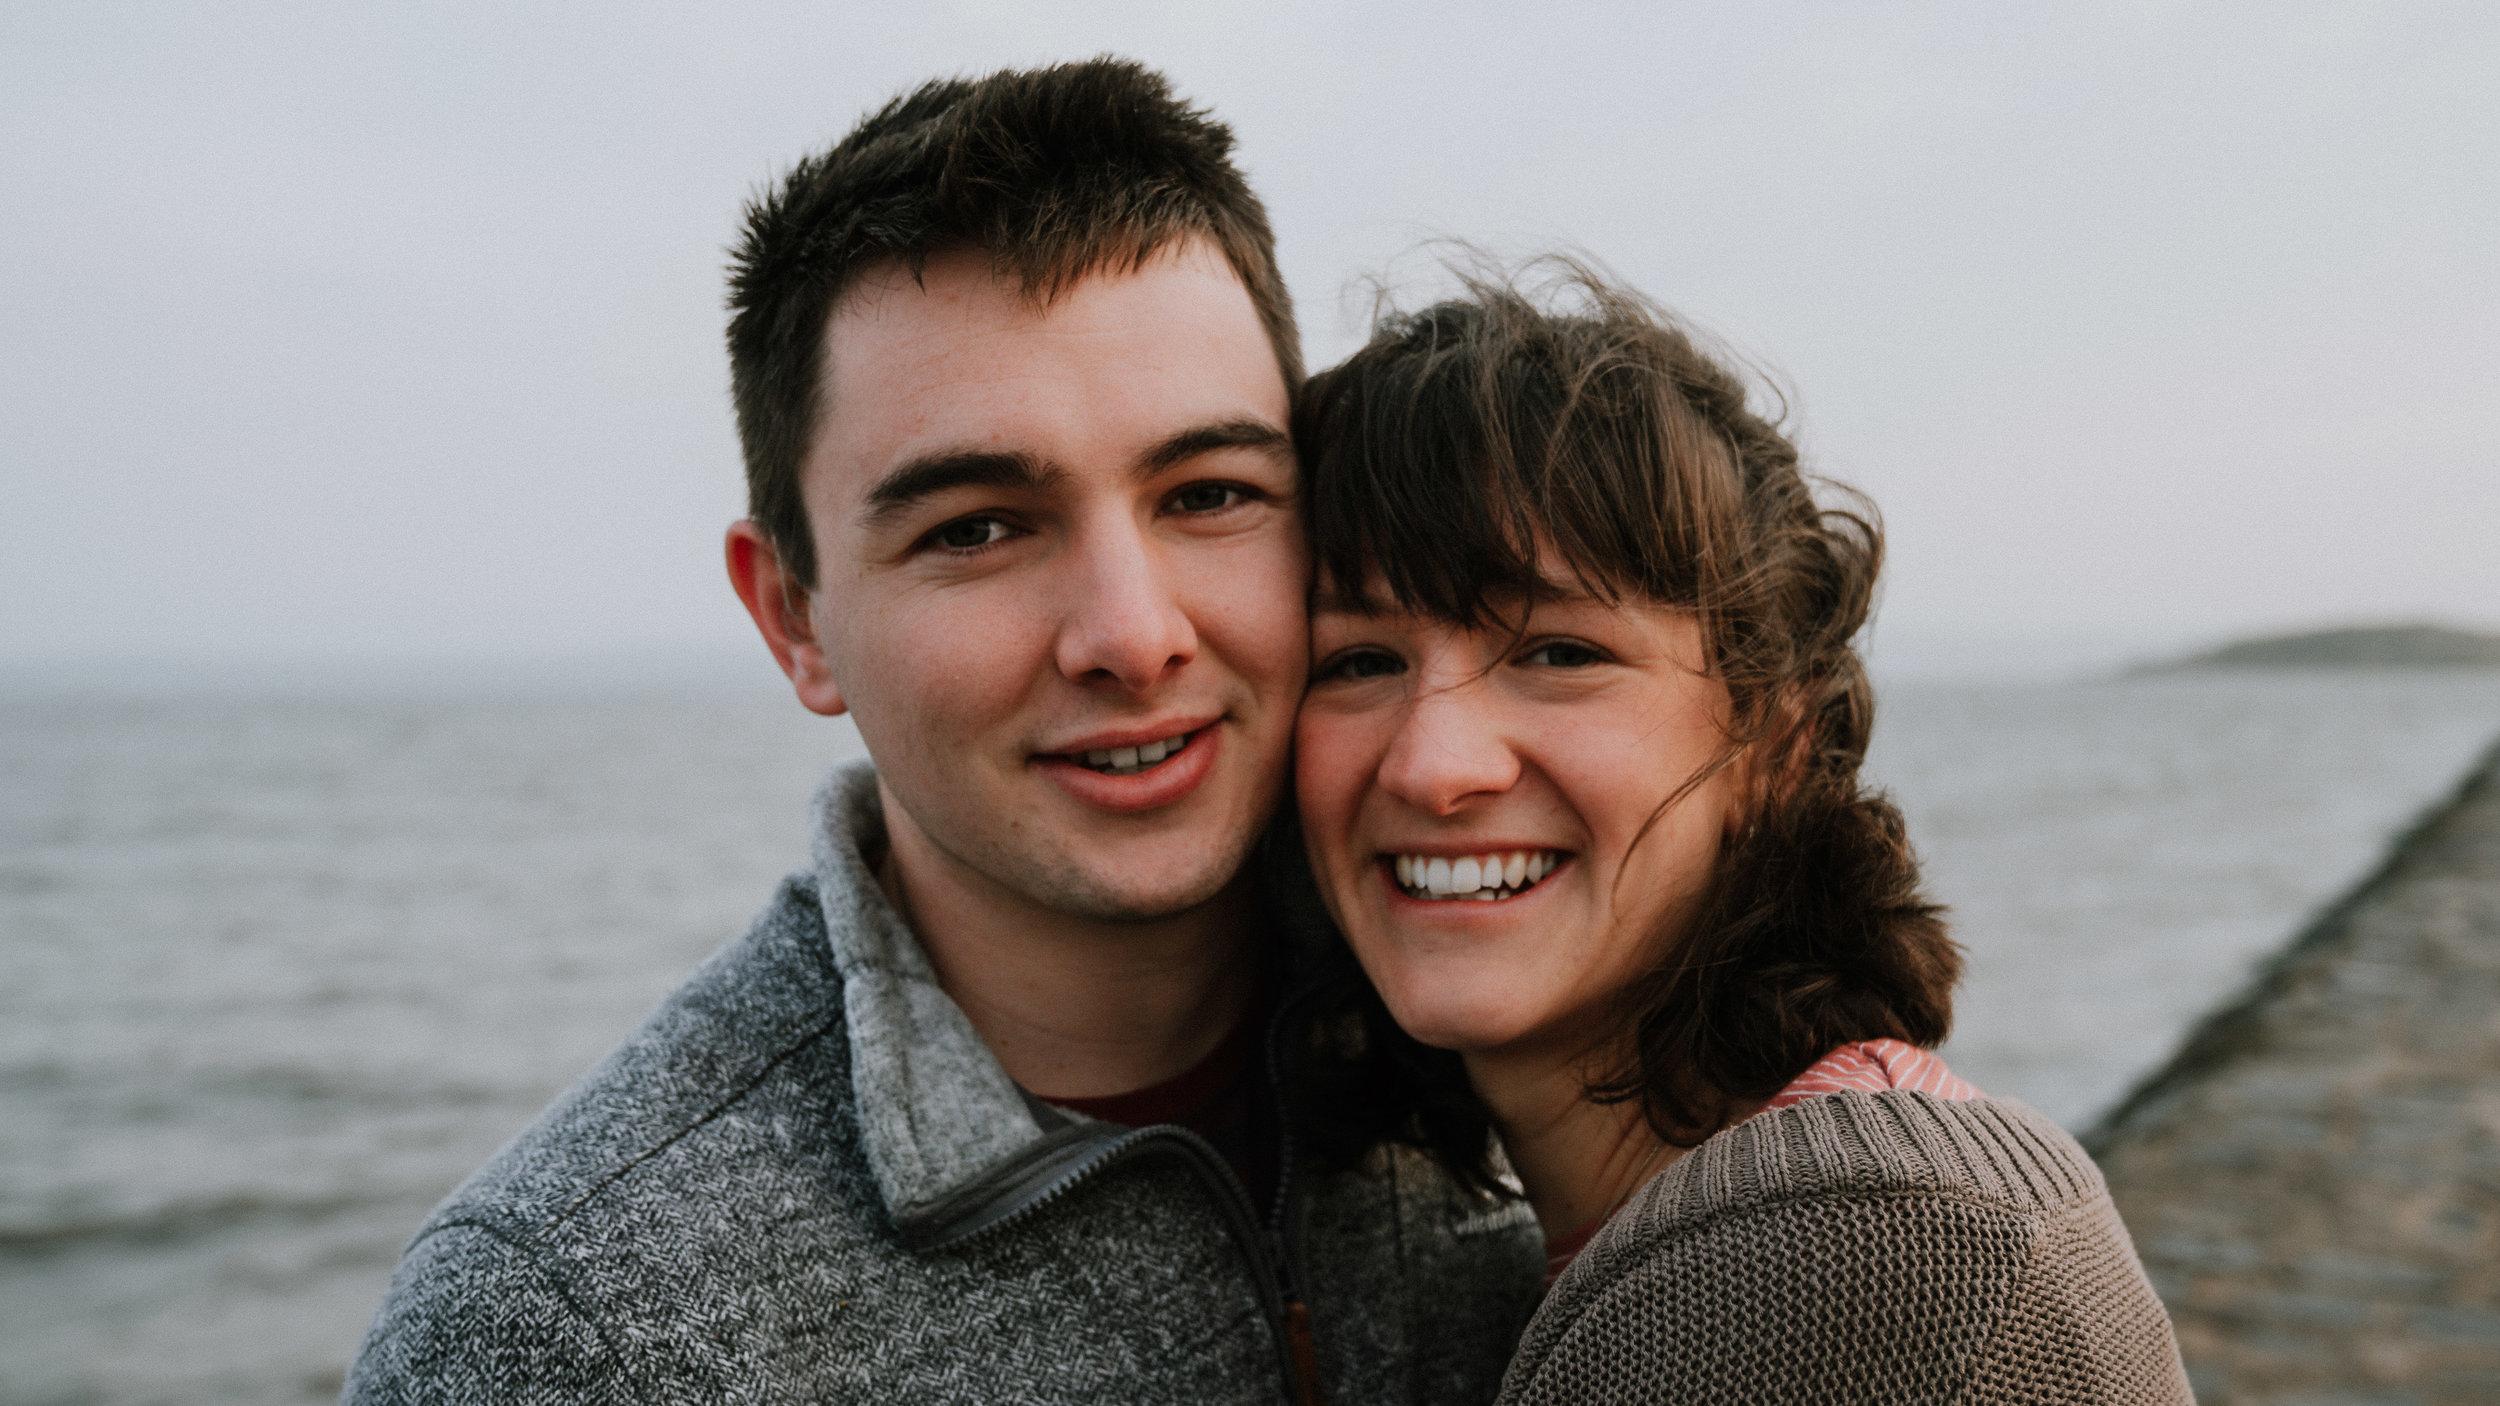 SALLY & HUGH - Engagement Shoot at Cramond Beach, Edinburgh